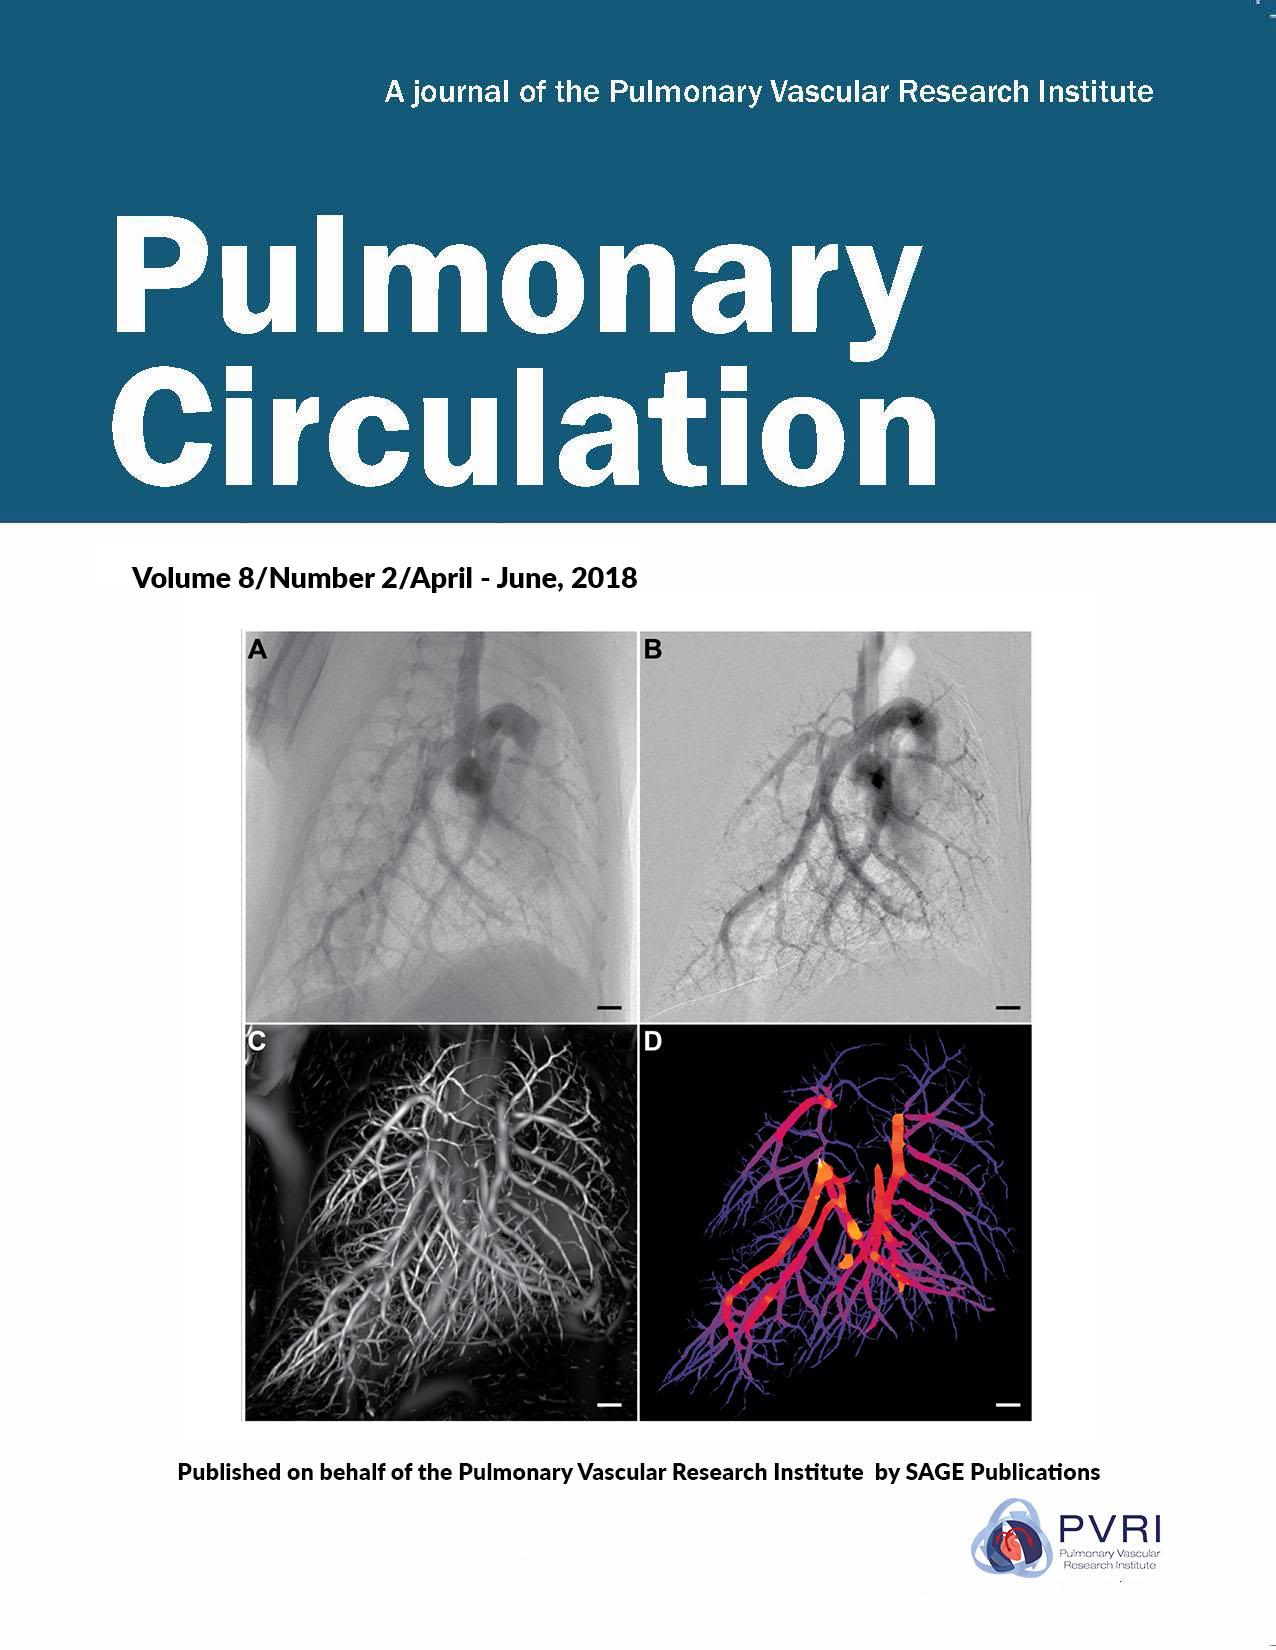 Explore Pulmonary Circulation Journal | PVRI